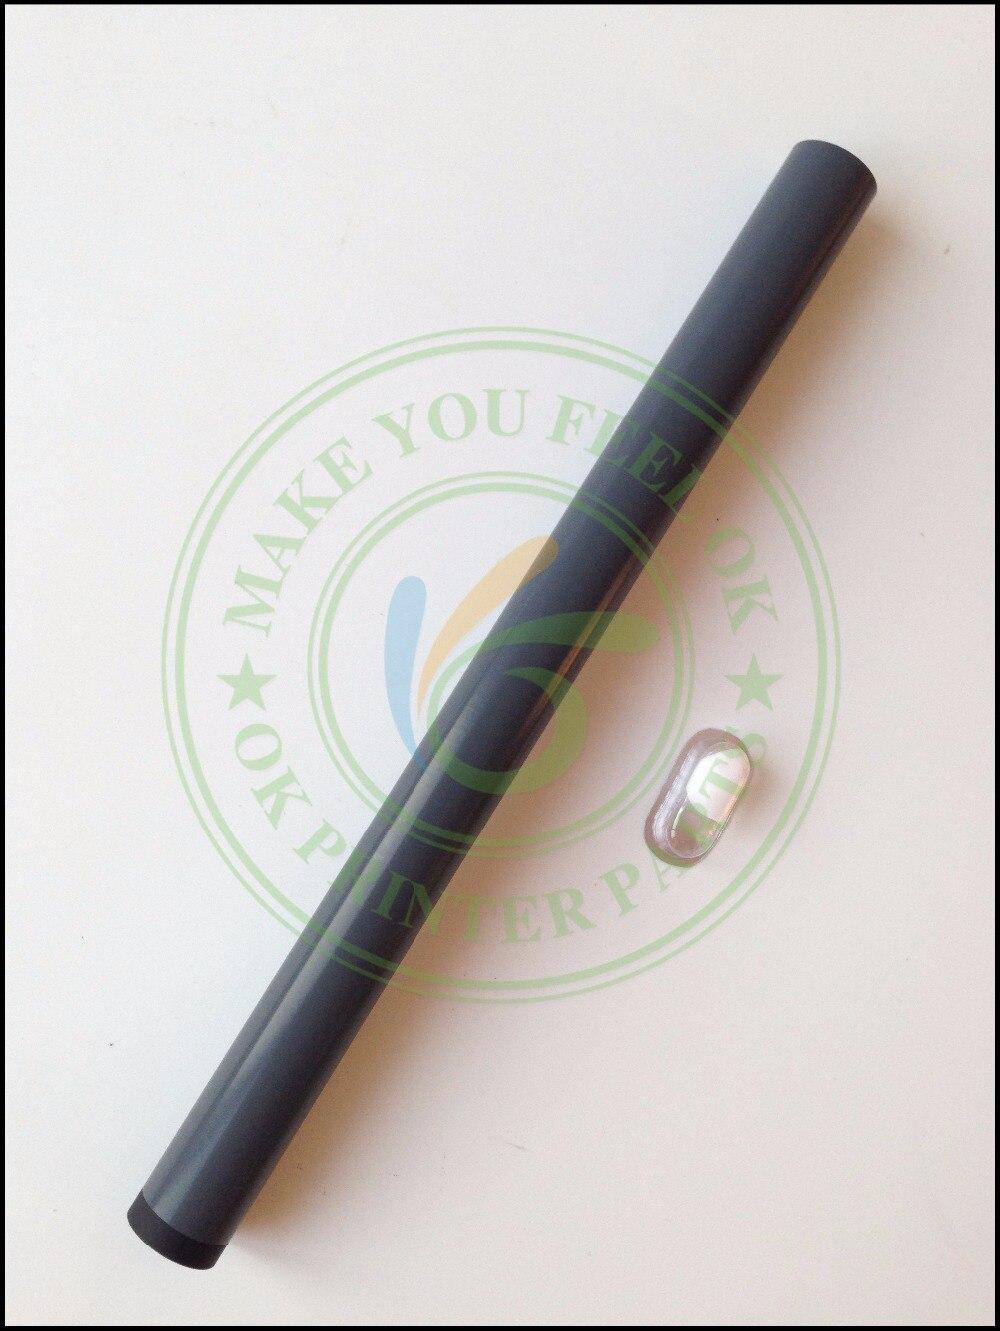 ORIGINAL Fuser film sleeve Fixing Film Sleeve Teflon + grease for HP P2035 P2055 P2030 P2050 M2727 P2014 Pro 400 M400 M401 M425